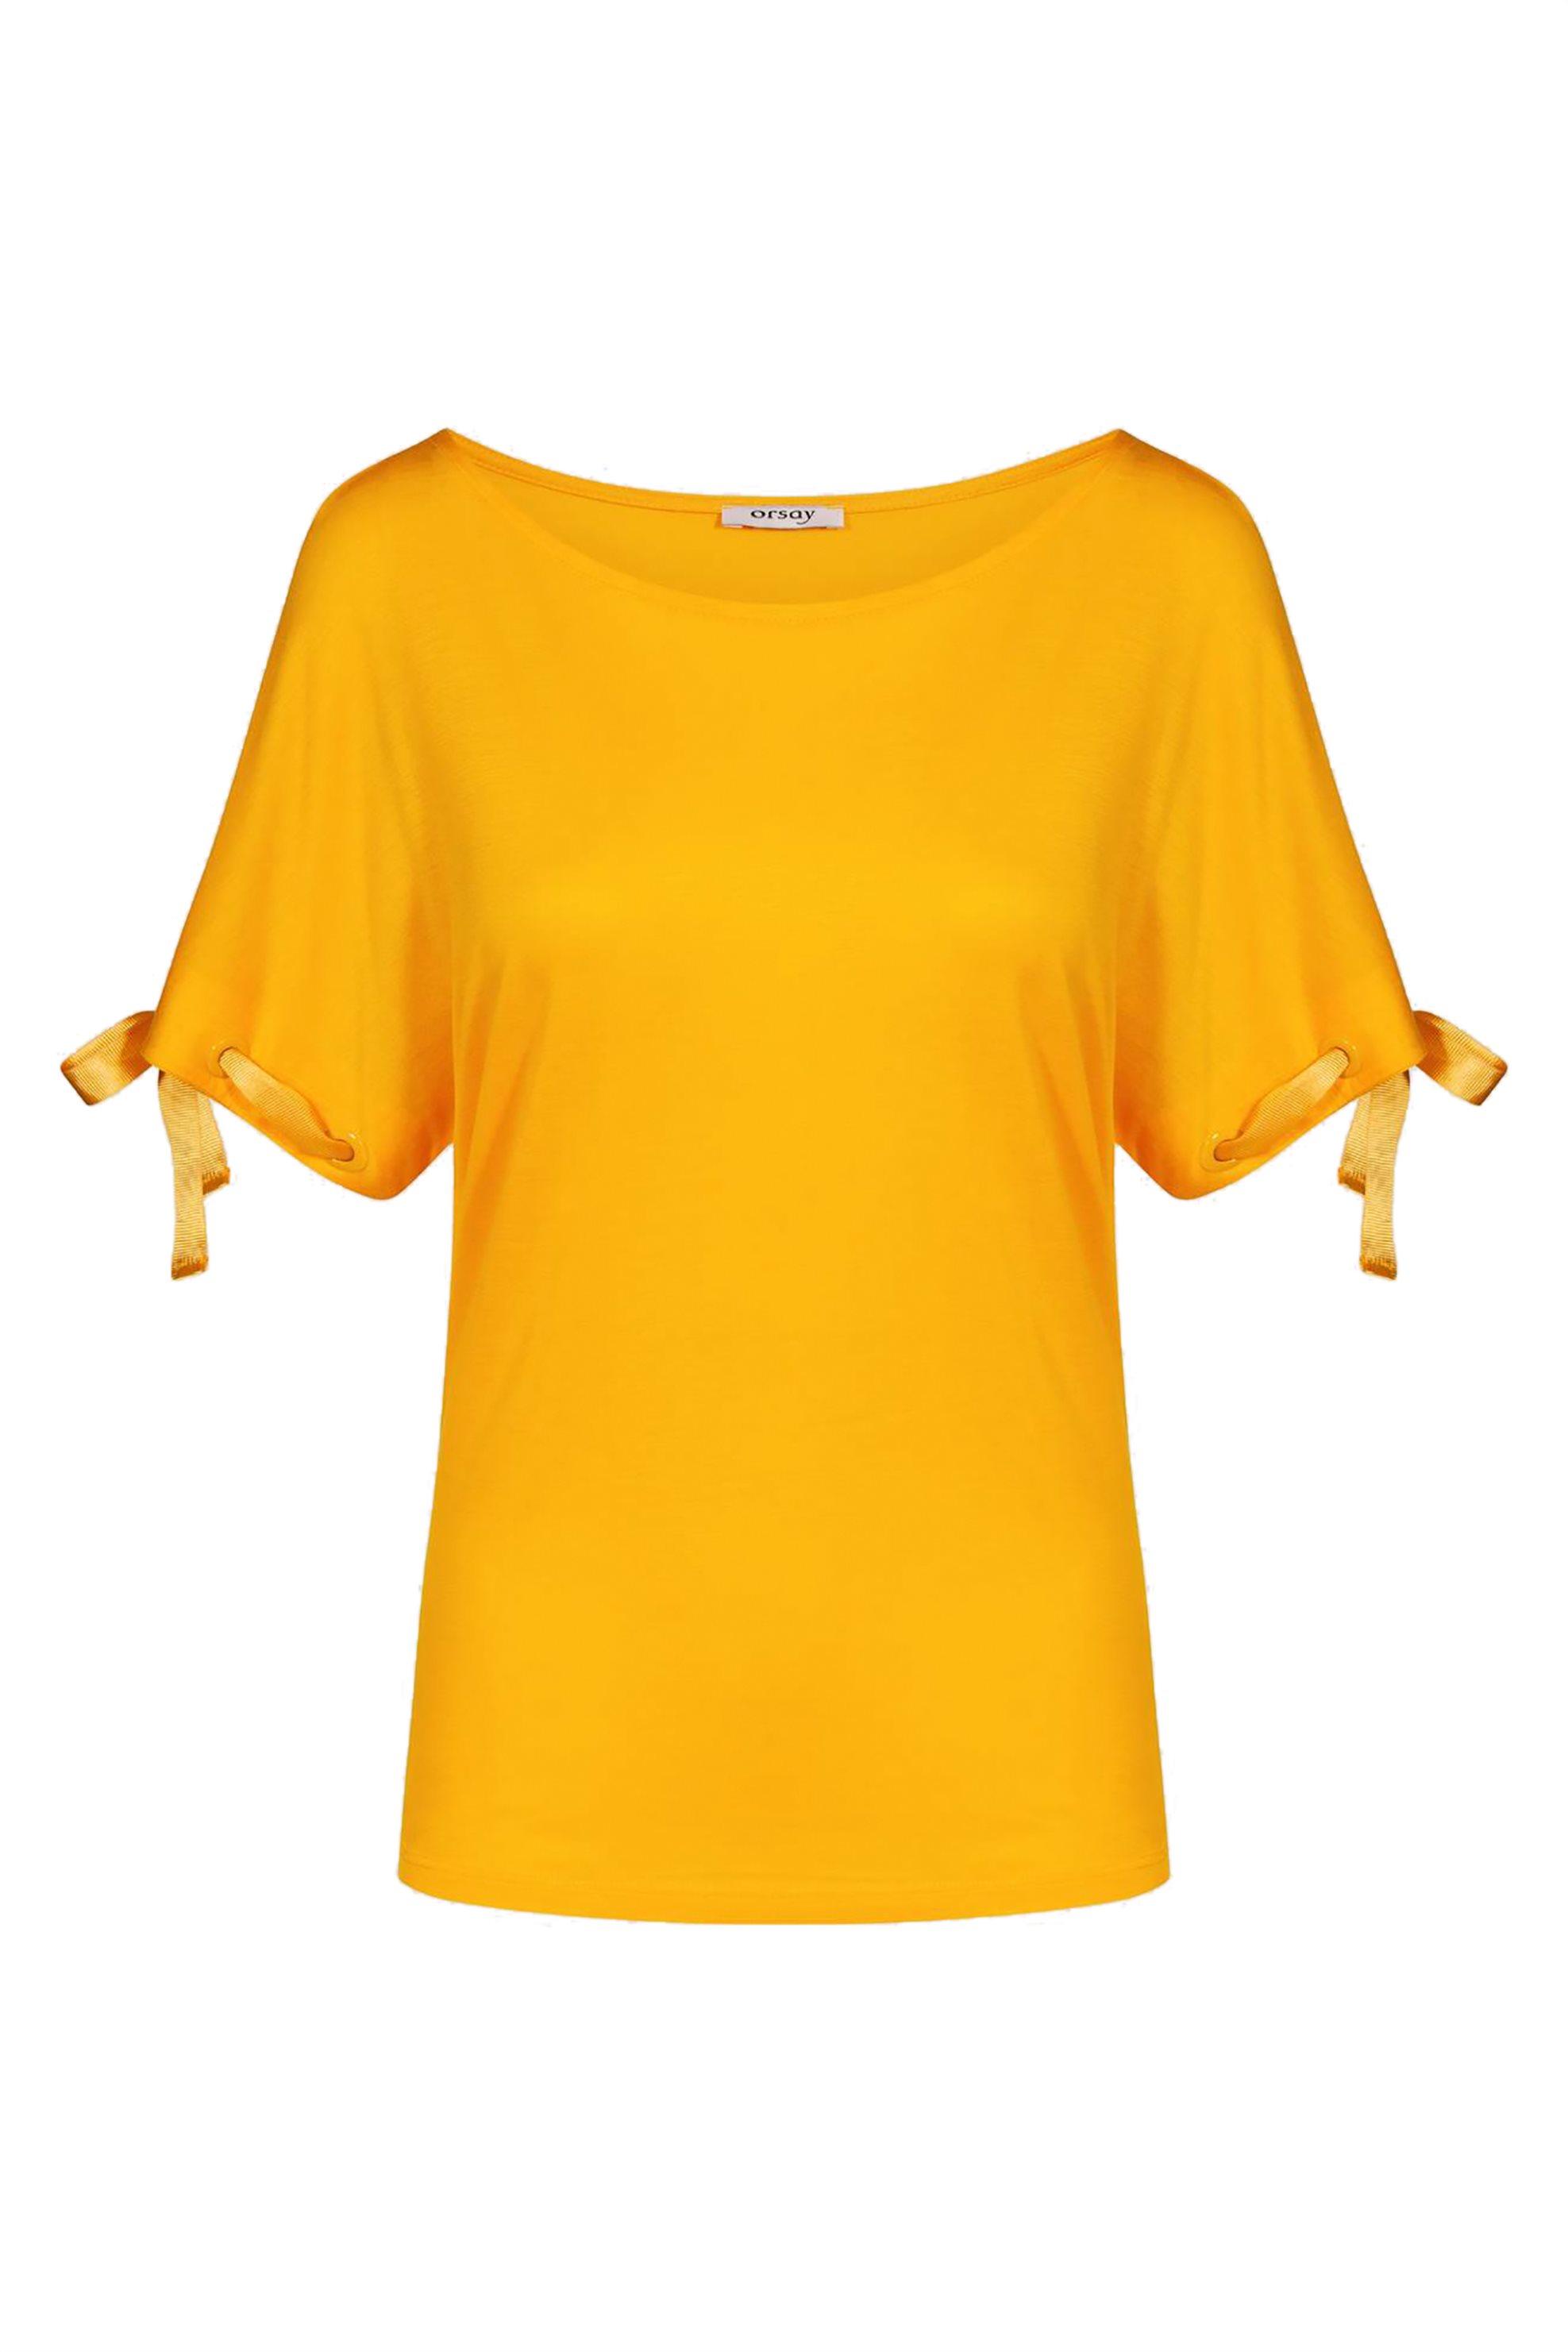 Orsay γυναικεία μπλούζα με κορδέλες - 153232-160000 - Κίτρινο γυναικα   ρουχα   tops   μπλούζες   casual